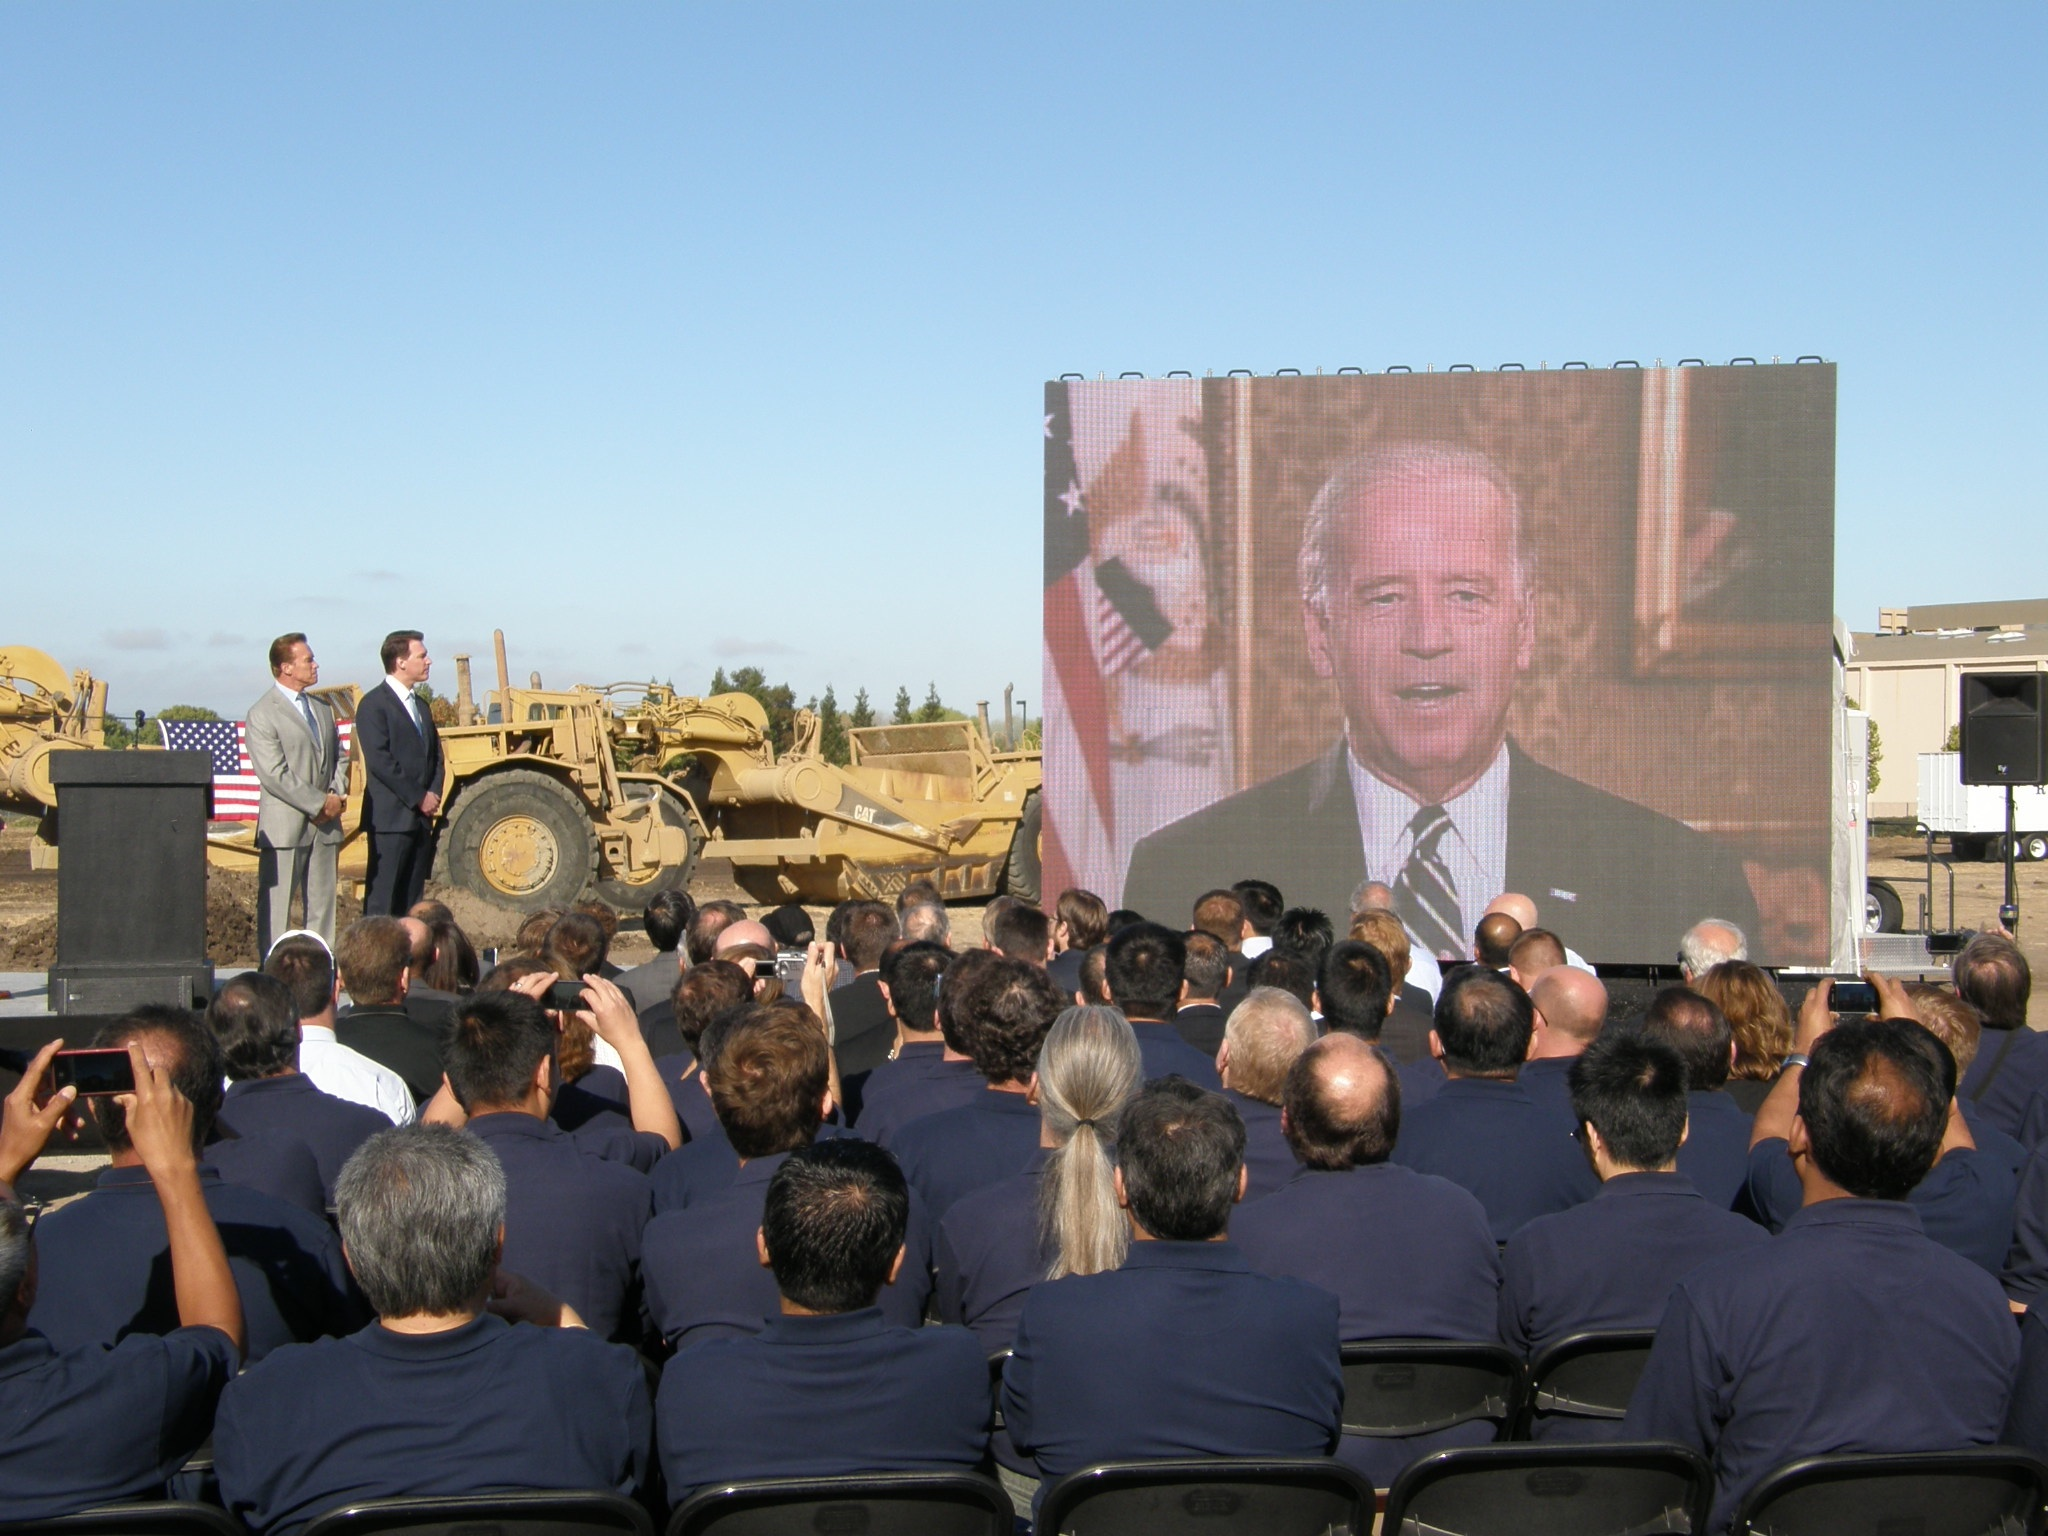 Joe Biden speaking at Solyndra's ground breaking in August 2010